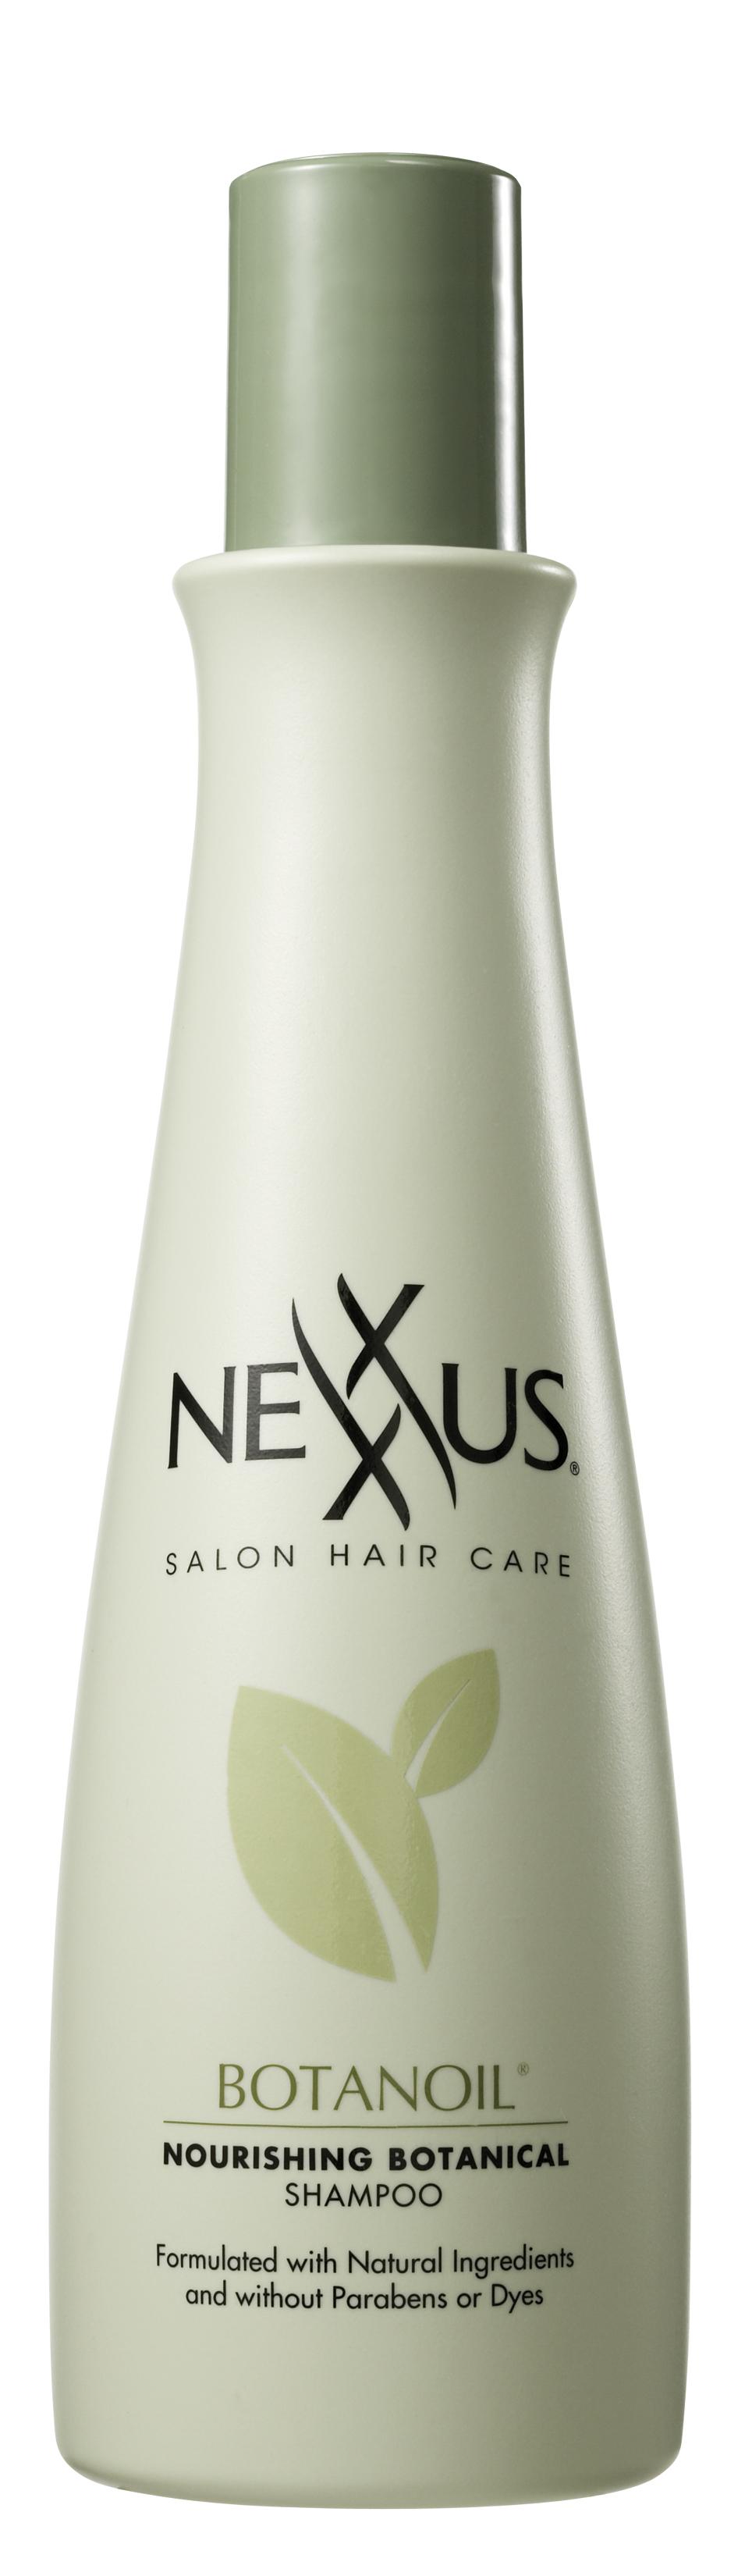 Nexxus Nourishing Botanicals Botanoil Shampoo - HaarfijnShop.NL